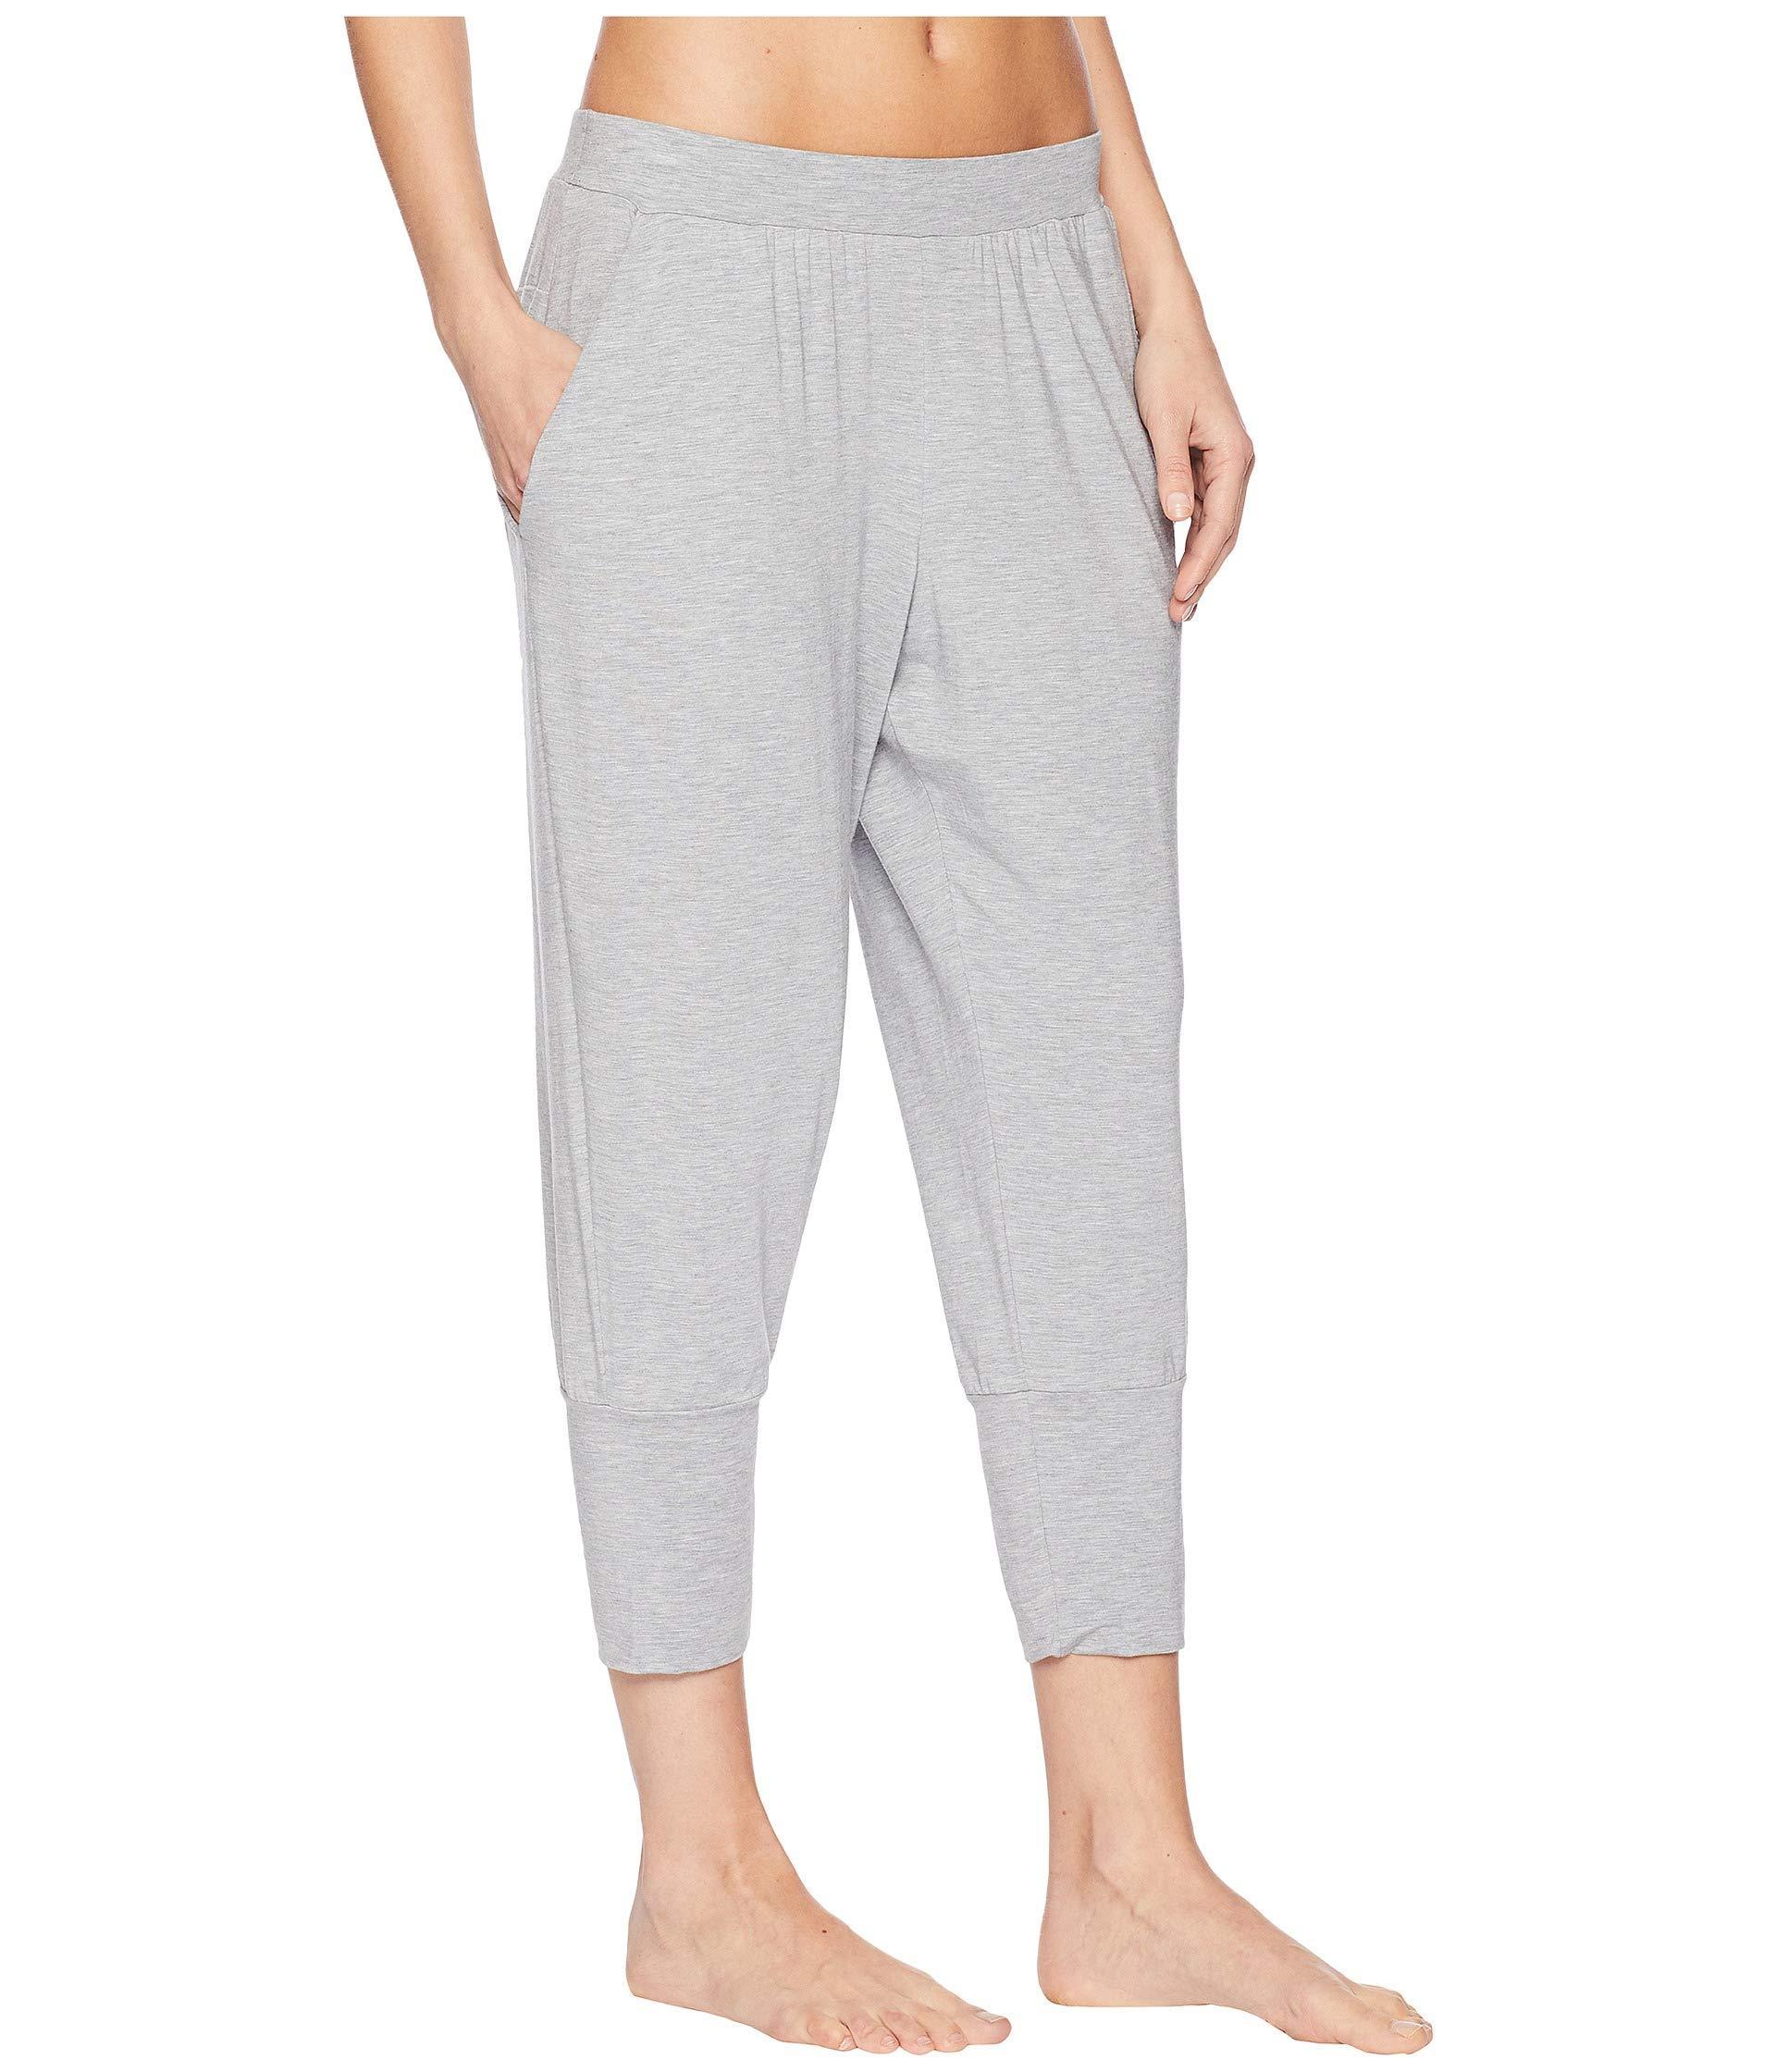 adad7661ff855 Hanro - Gray Yoga Crop Pants - Lyst. View fullscreen